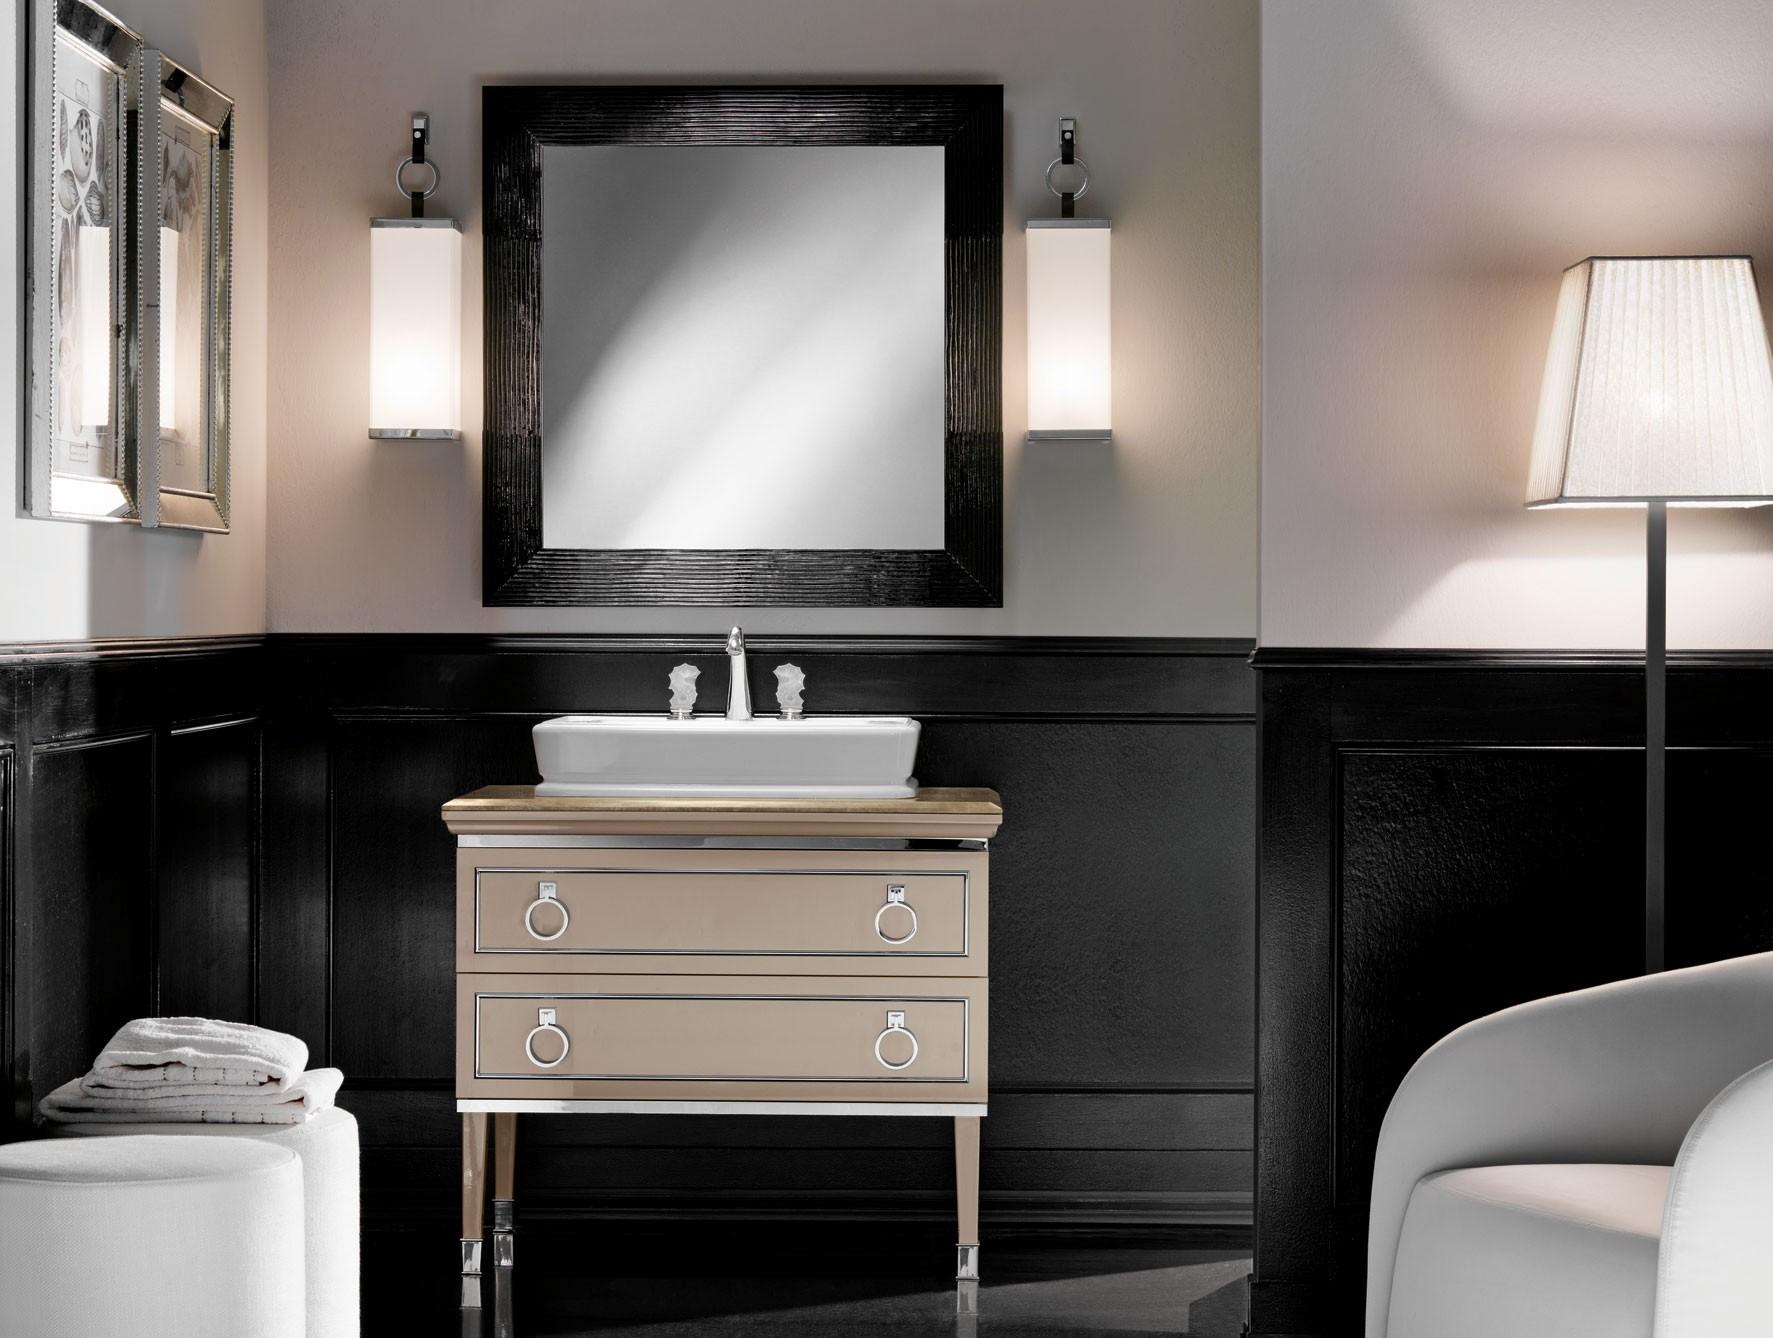 Modern Art Deco Bathroom Vanity Concept Bathroom Design Ideas